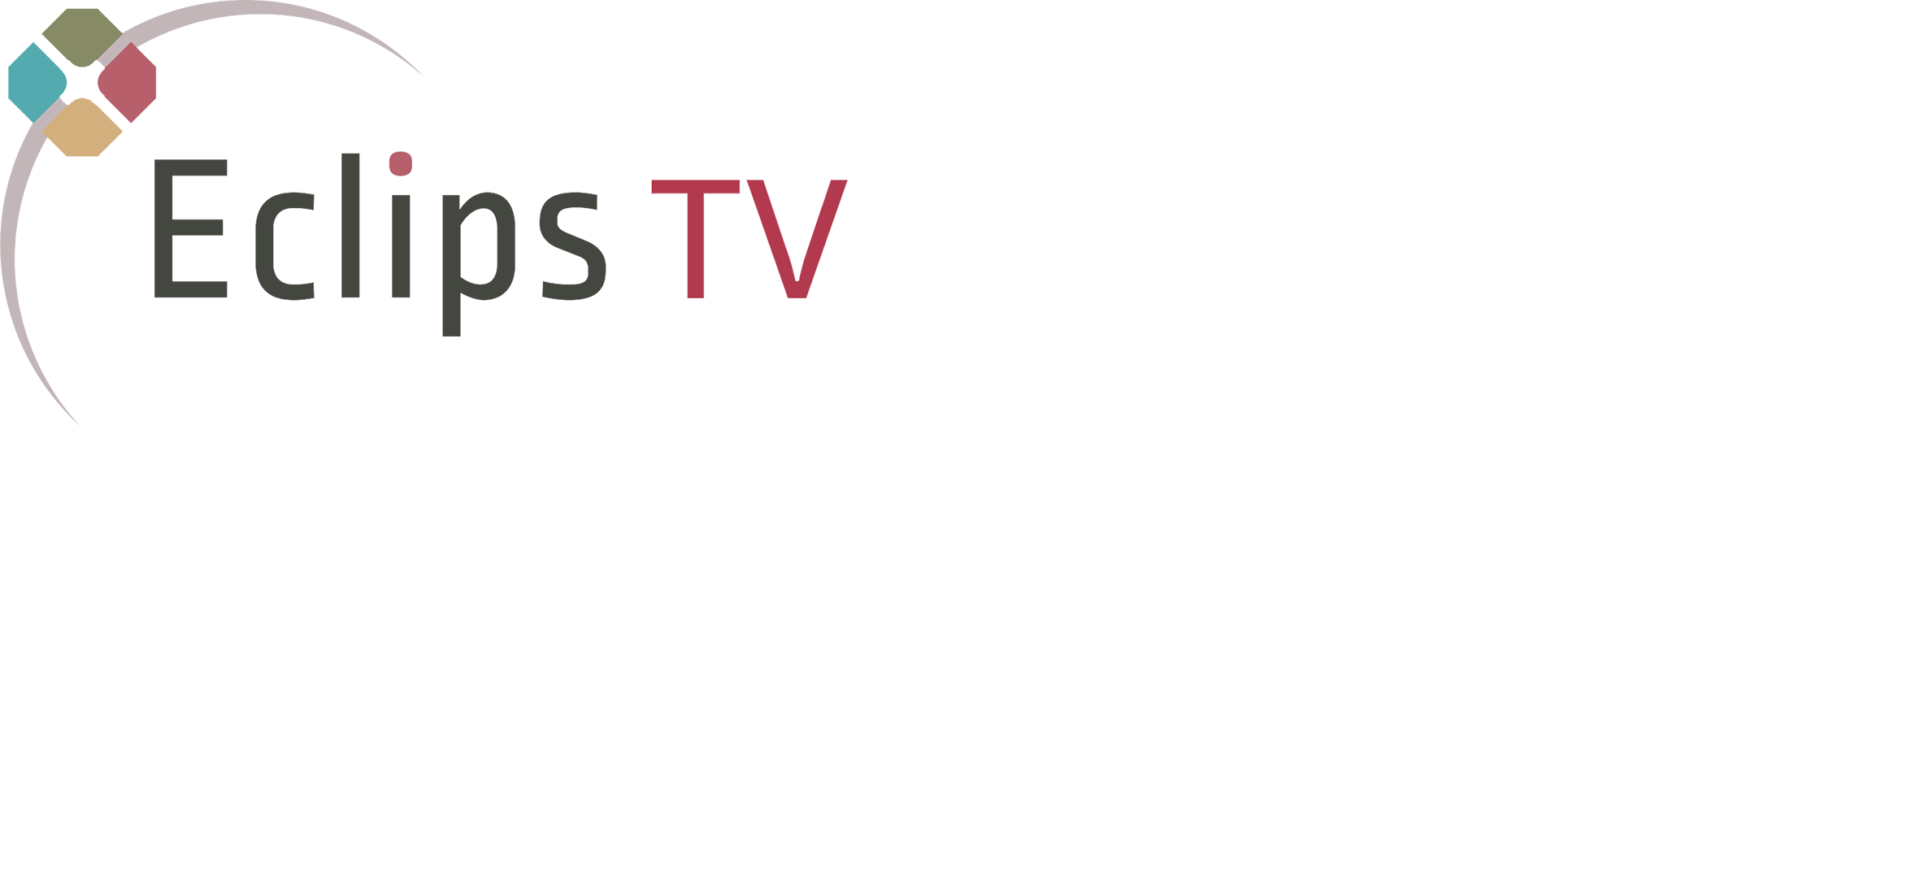 Eclips TV Transfer